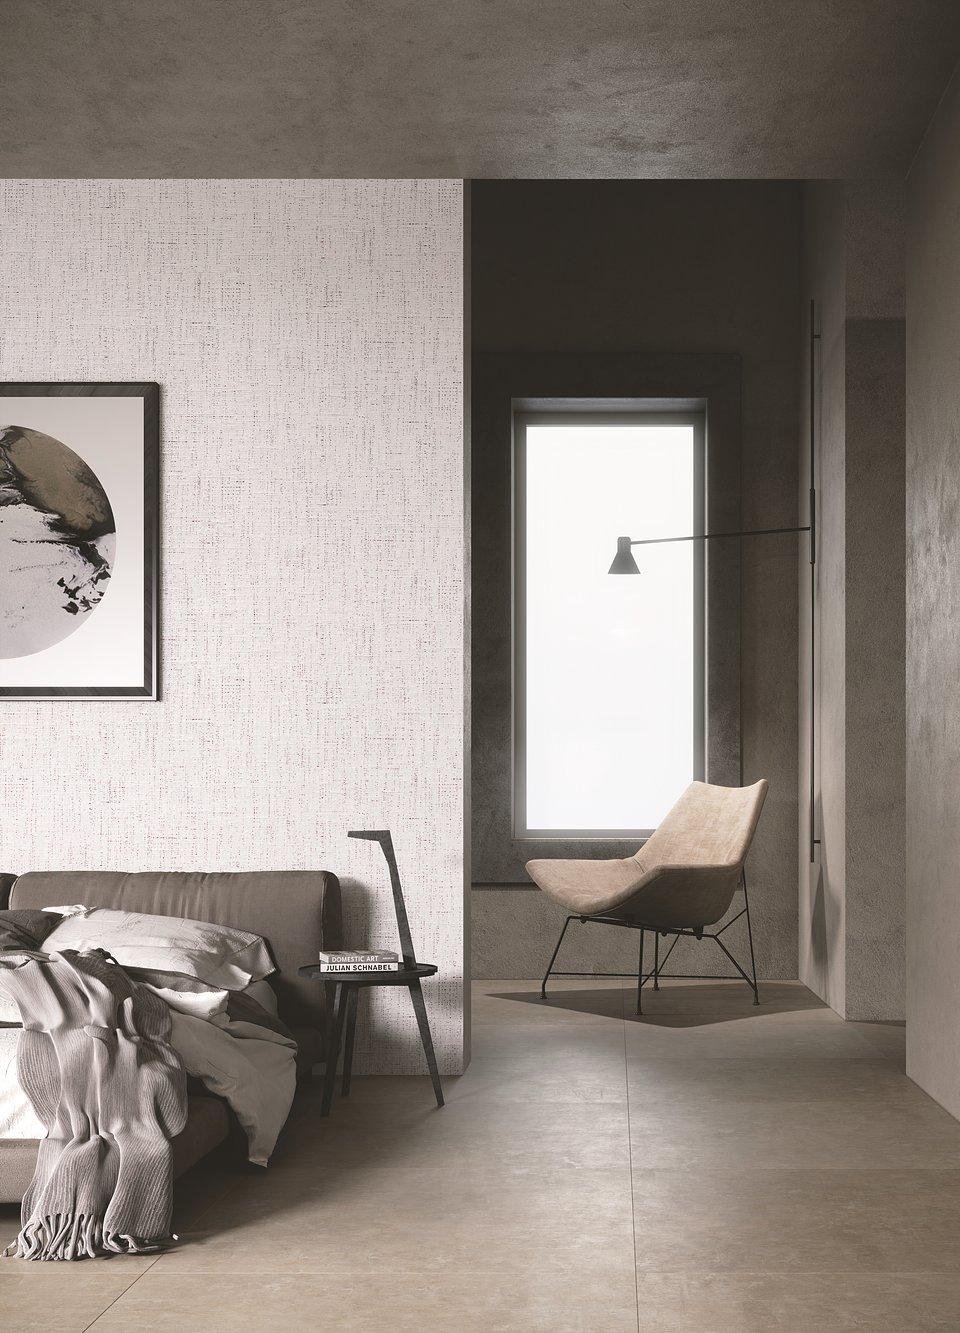 Eterea Coll_Impressioni_wallpaper.jpg